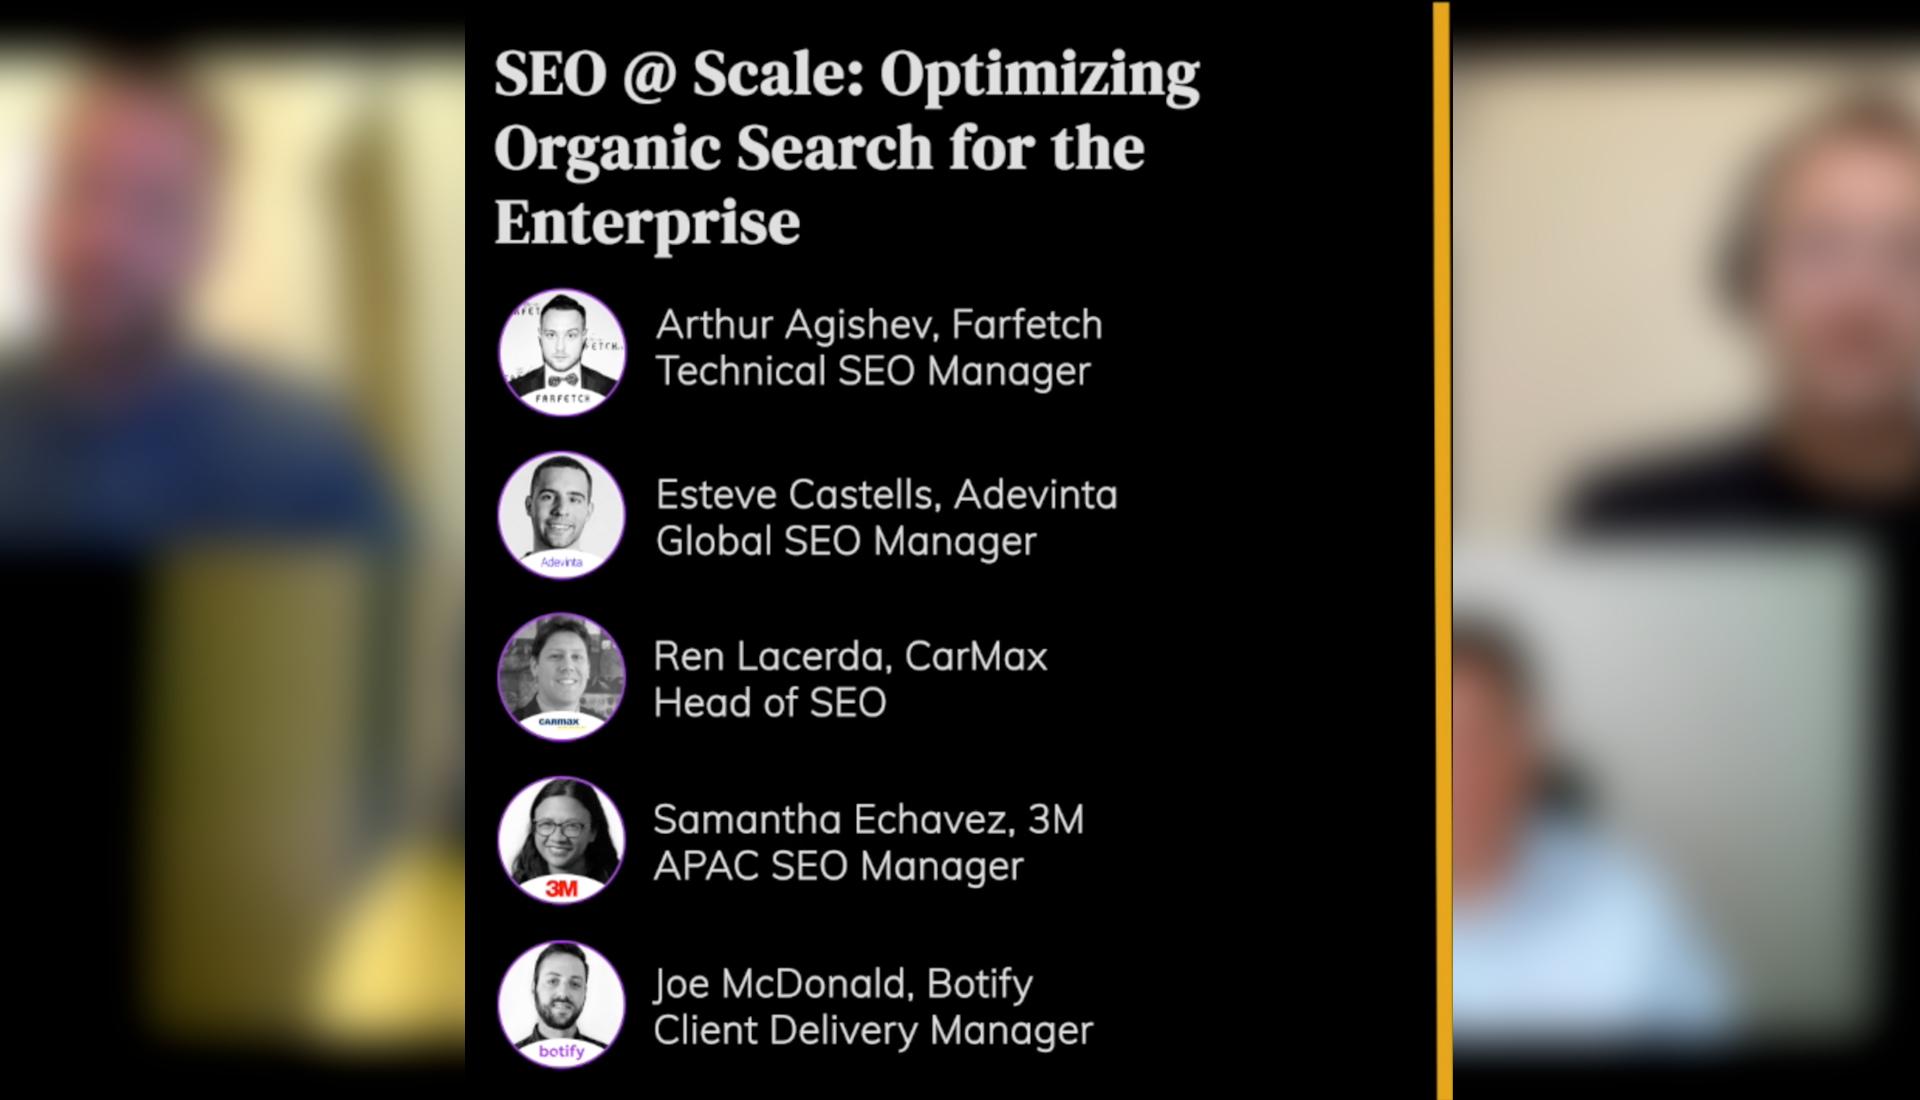 SEO @ Scale: Optimizing Organic Search for the Enterprise